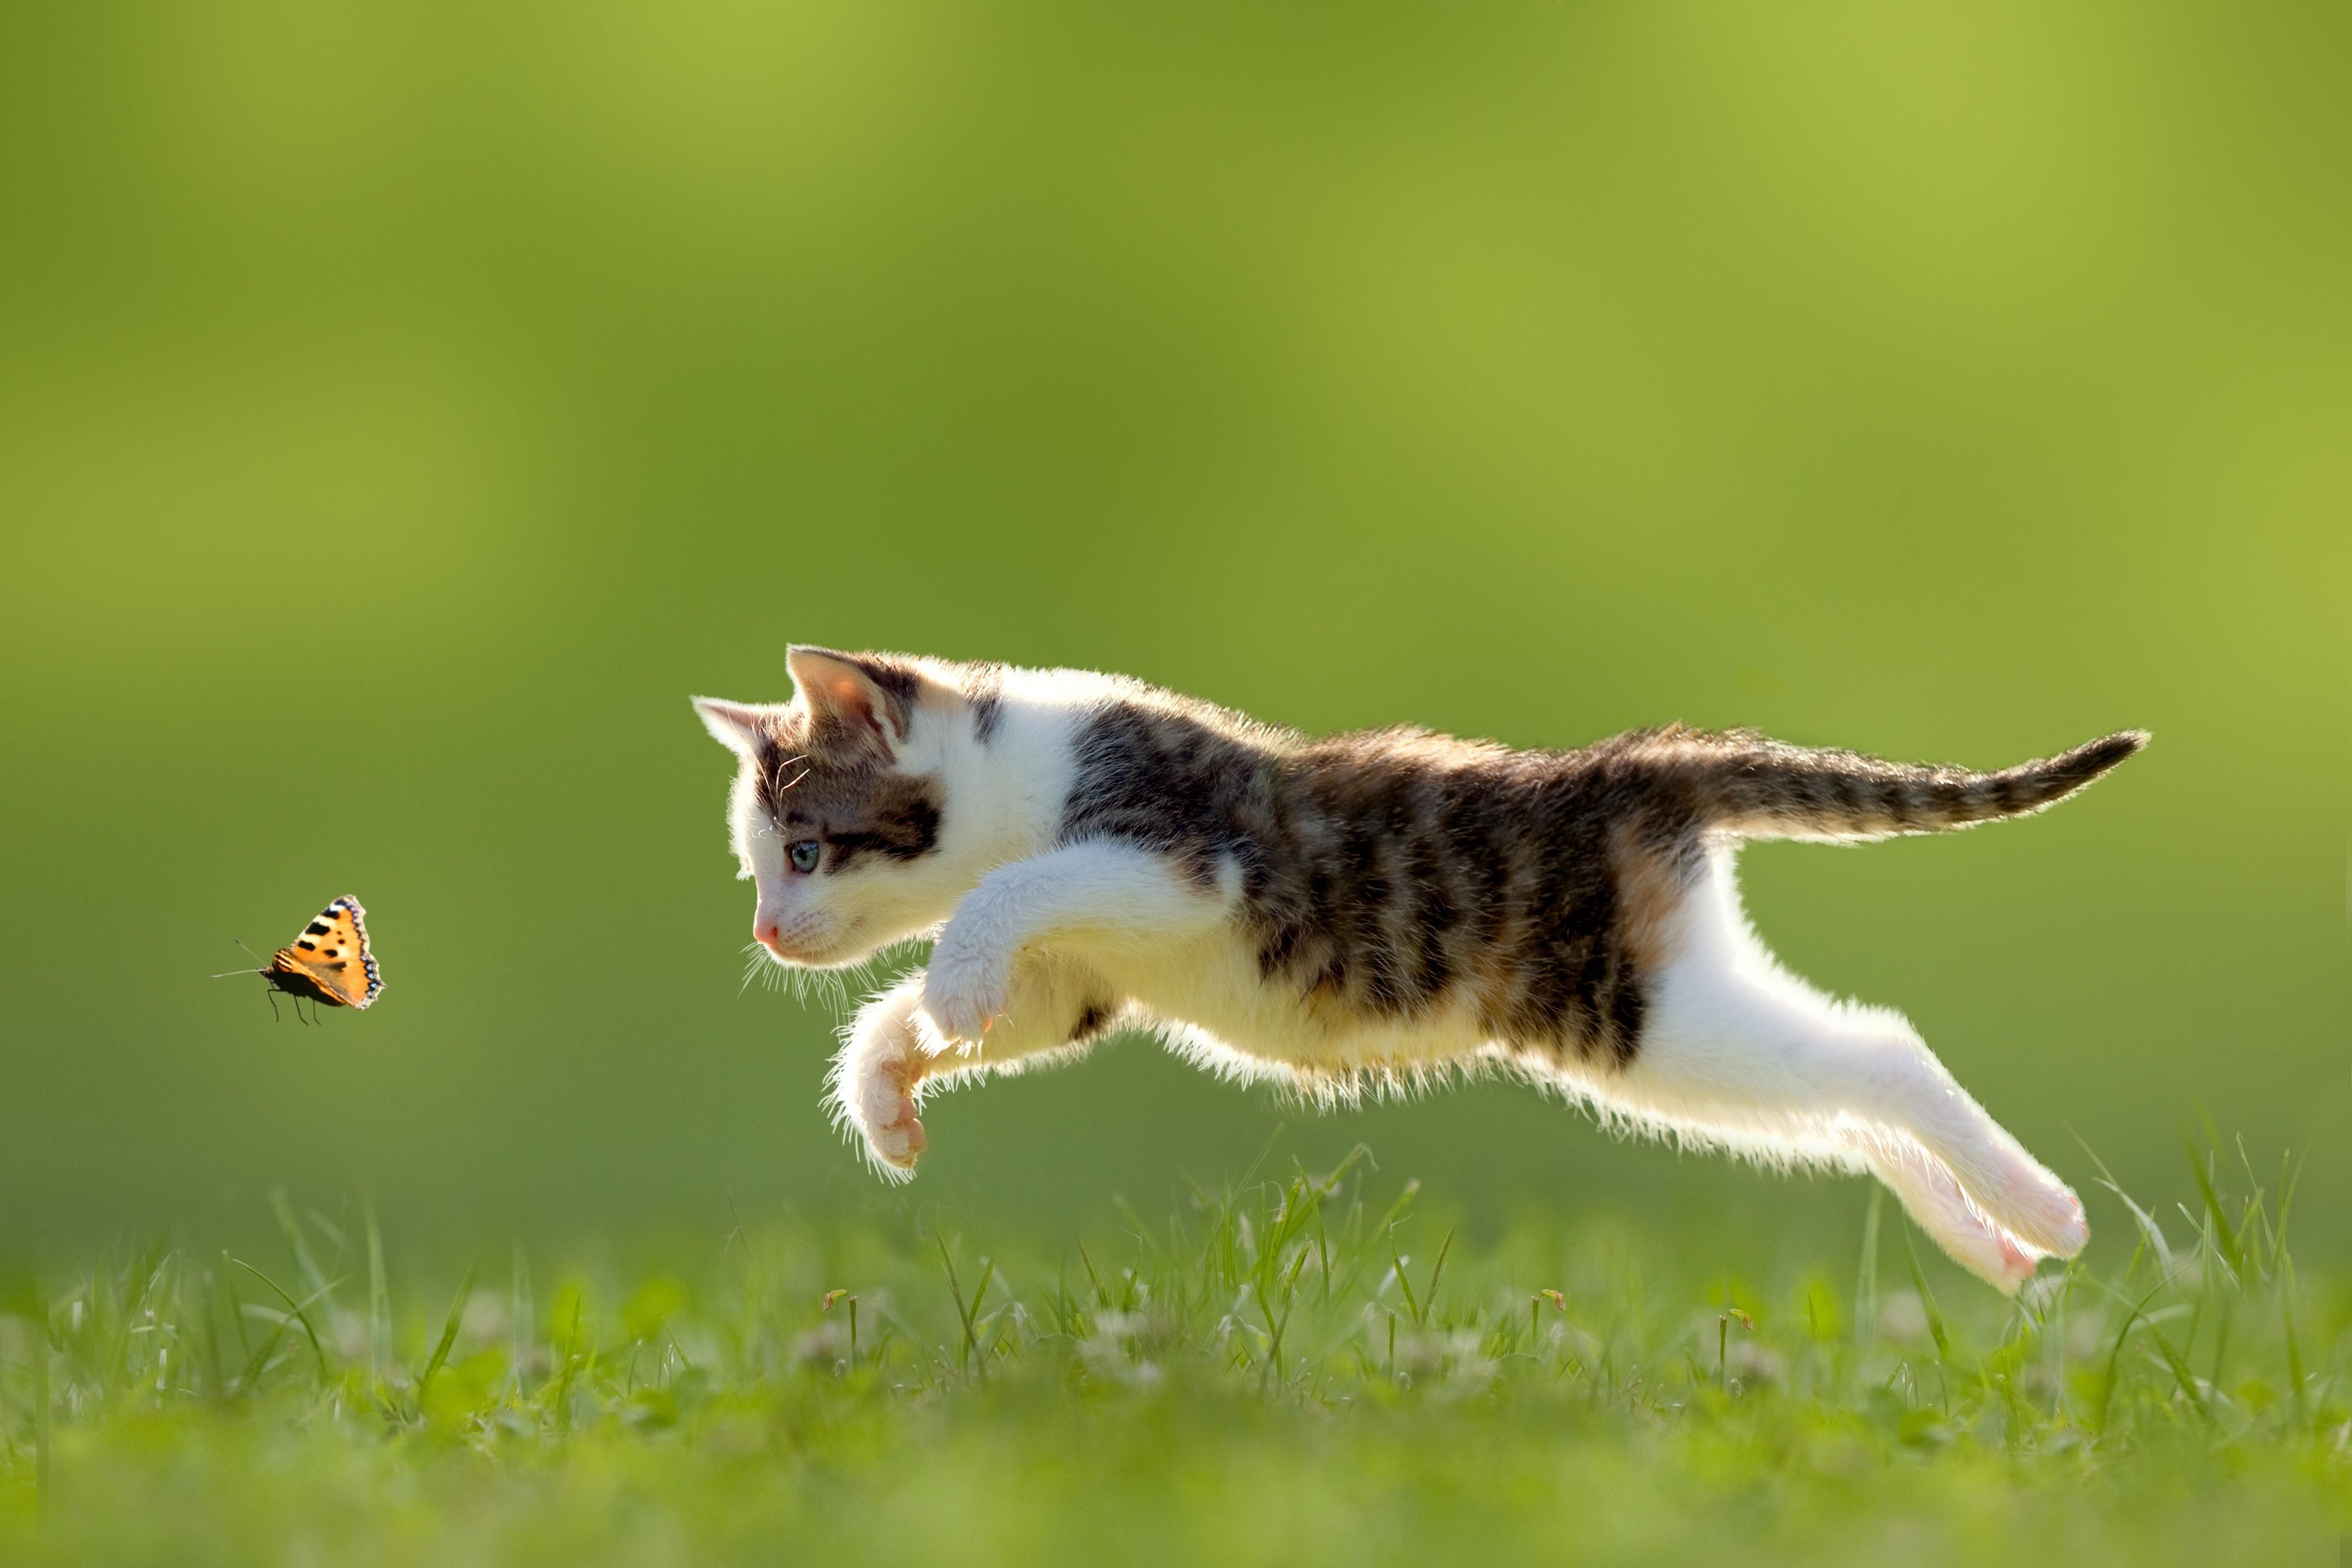 Best Wallpaper Cat Butterfly - cat-animals-depth-of-field-nature-grass-butterfly-kittens-baby-animals-whiskers-running-wild-cat-fauna-mammal-vertebrate-cat-like-mammal-macro-photography-small-to-medium-sized-cats-162942  2018_194758 .jpg